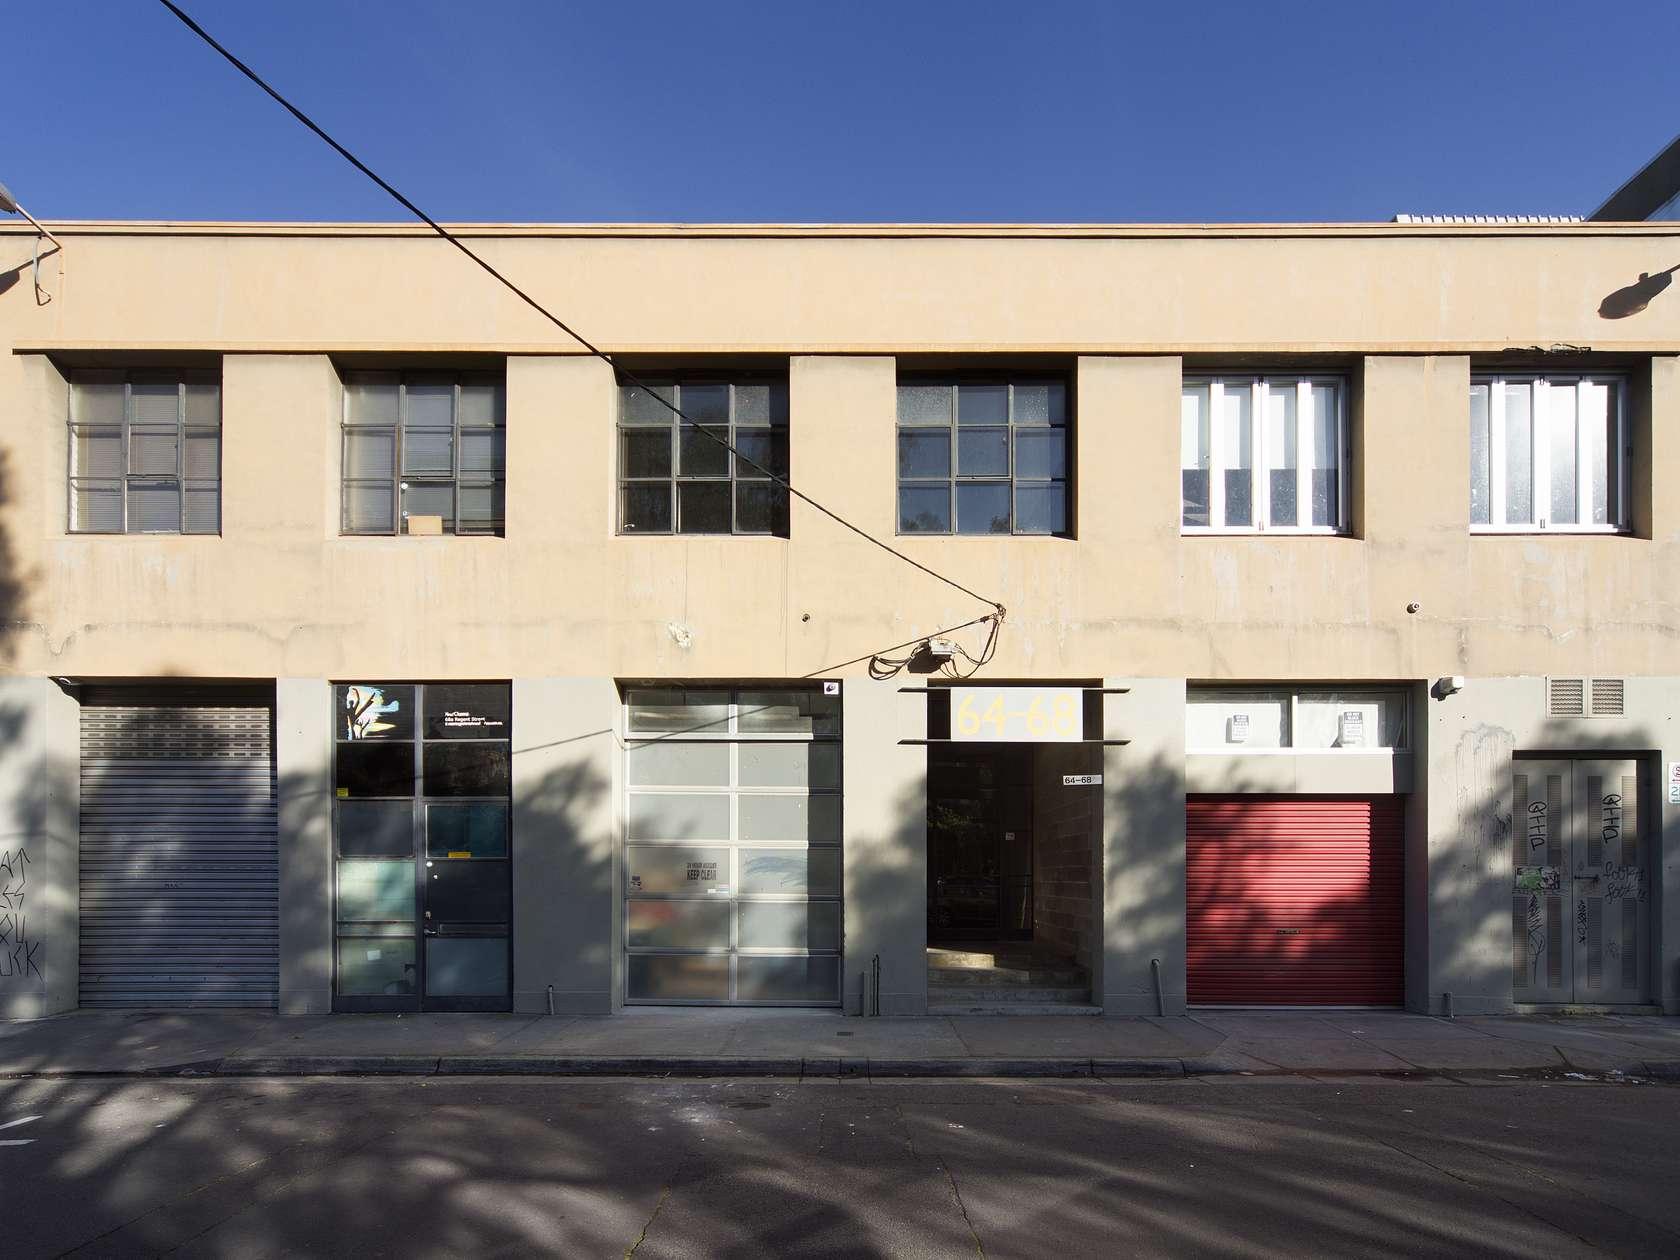 Regent Street Warehouse by Techne Architecture (via Lunchbox Architect)